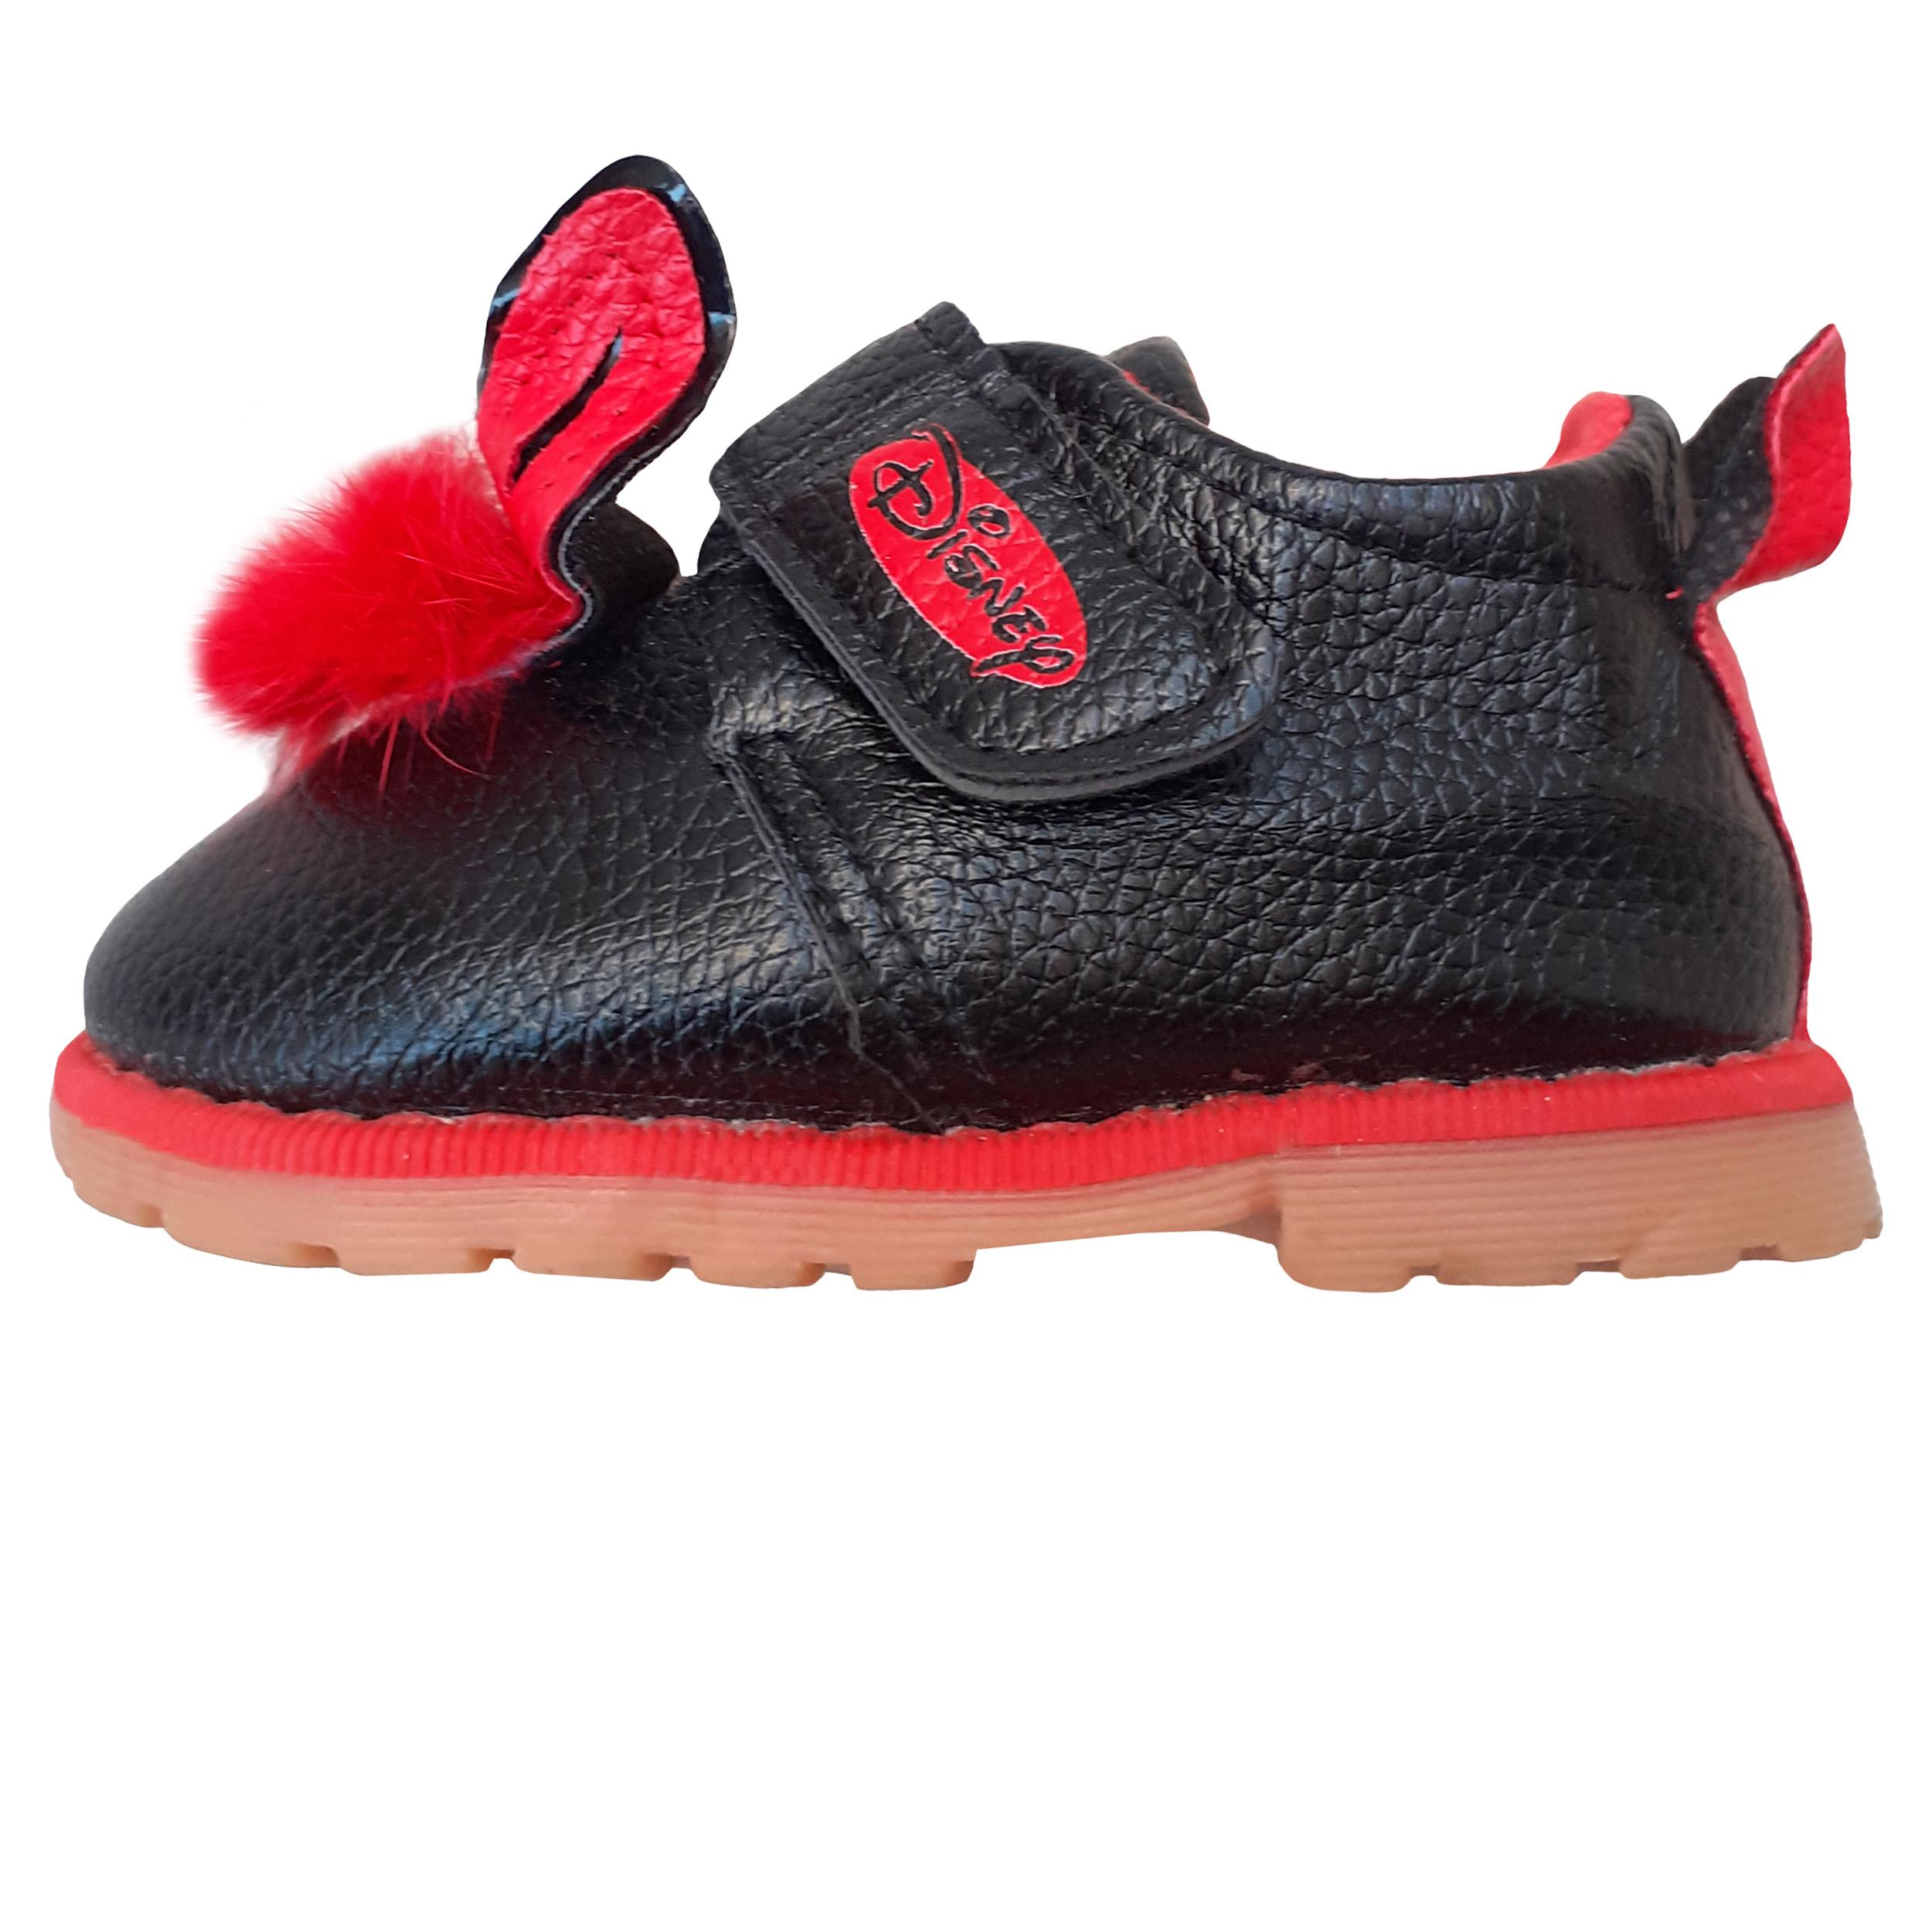 کفش  دخترانه دیزنی کد k90